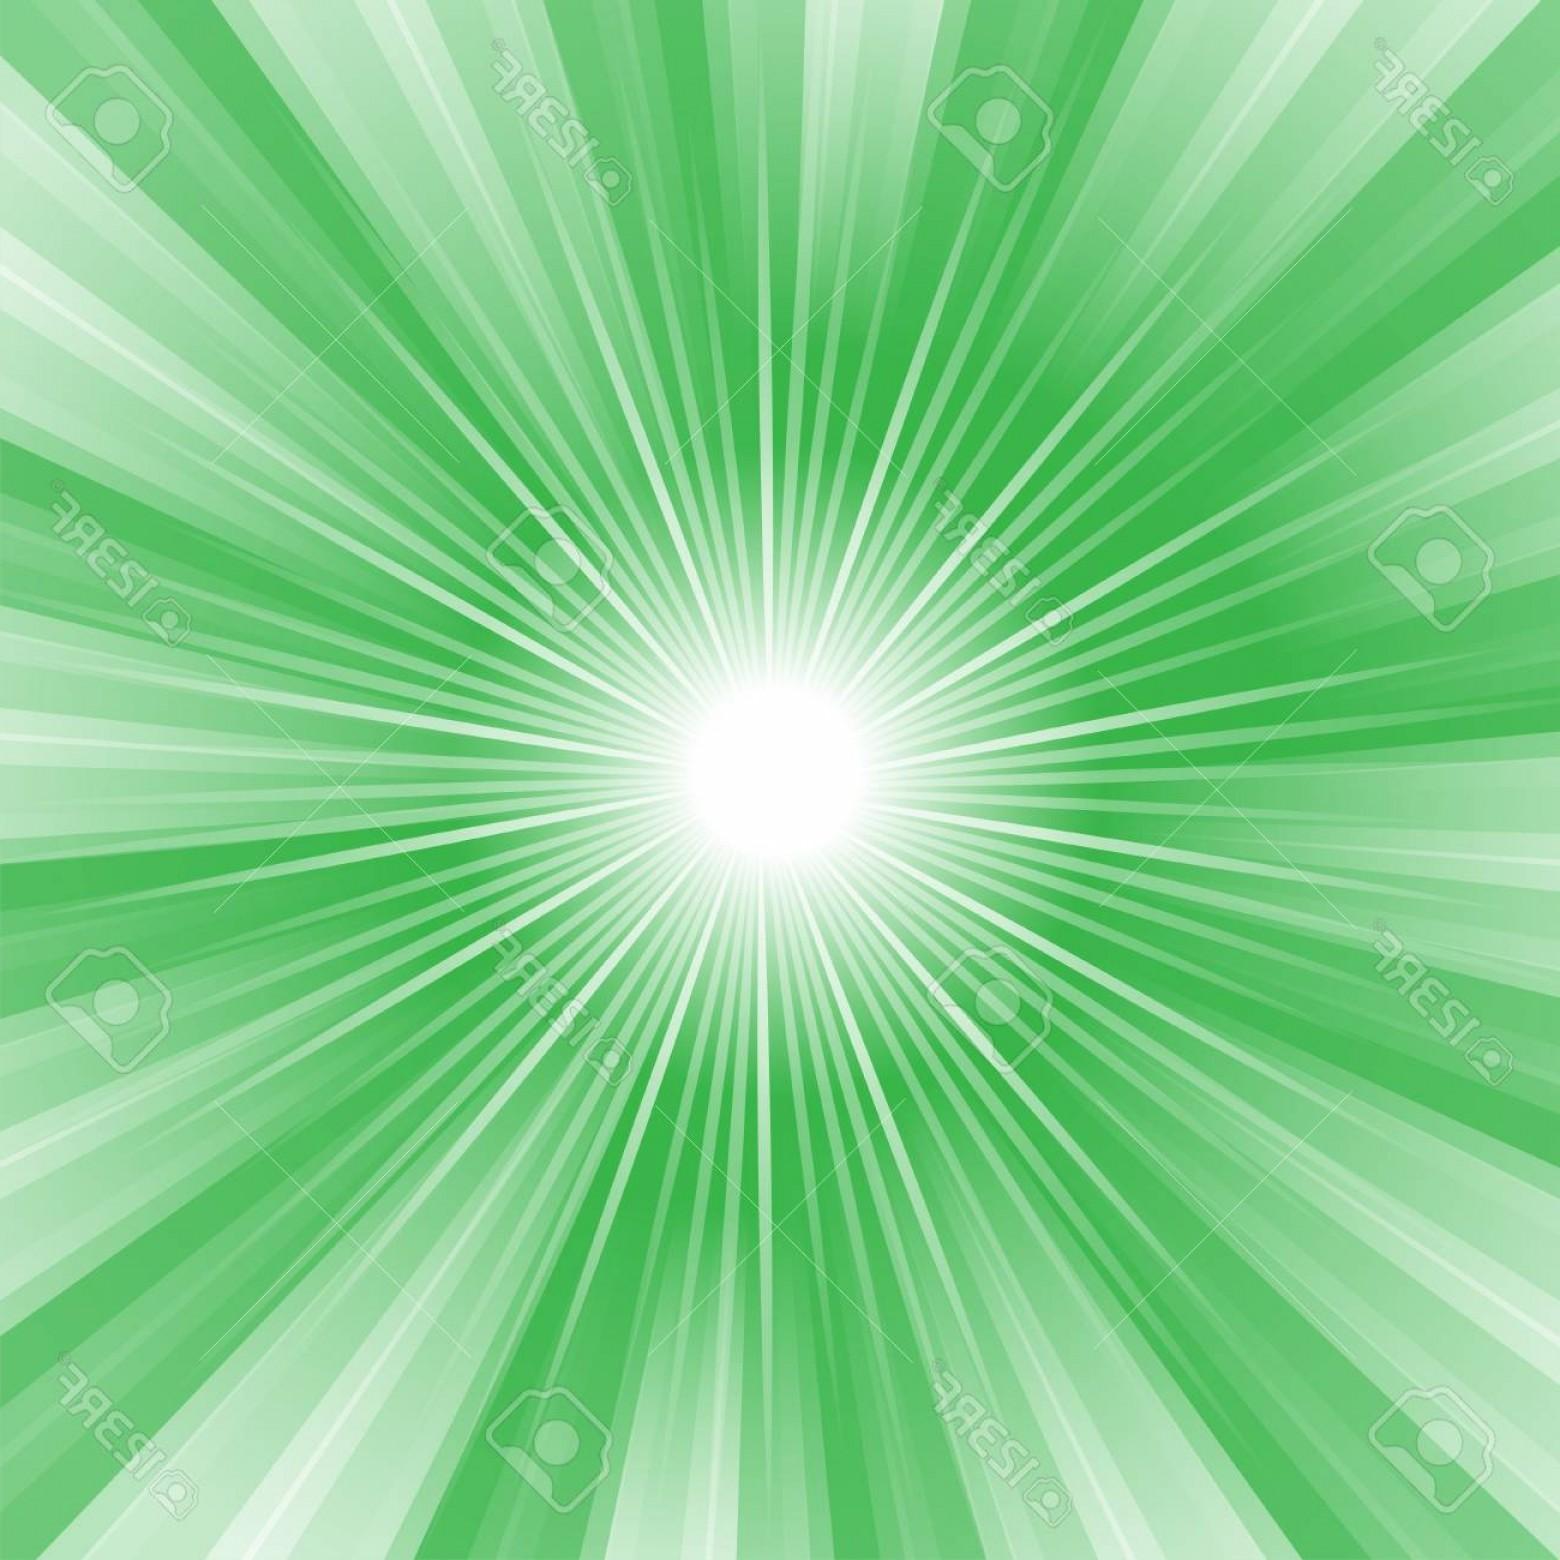 Green light ray jpeg clipart graphic transparent Green Light Burst Vector   lamaison graphic transparent